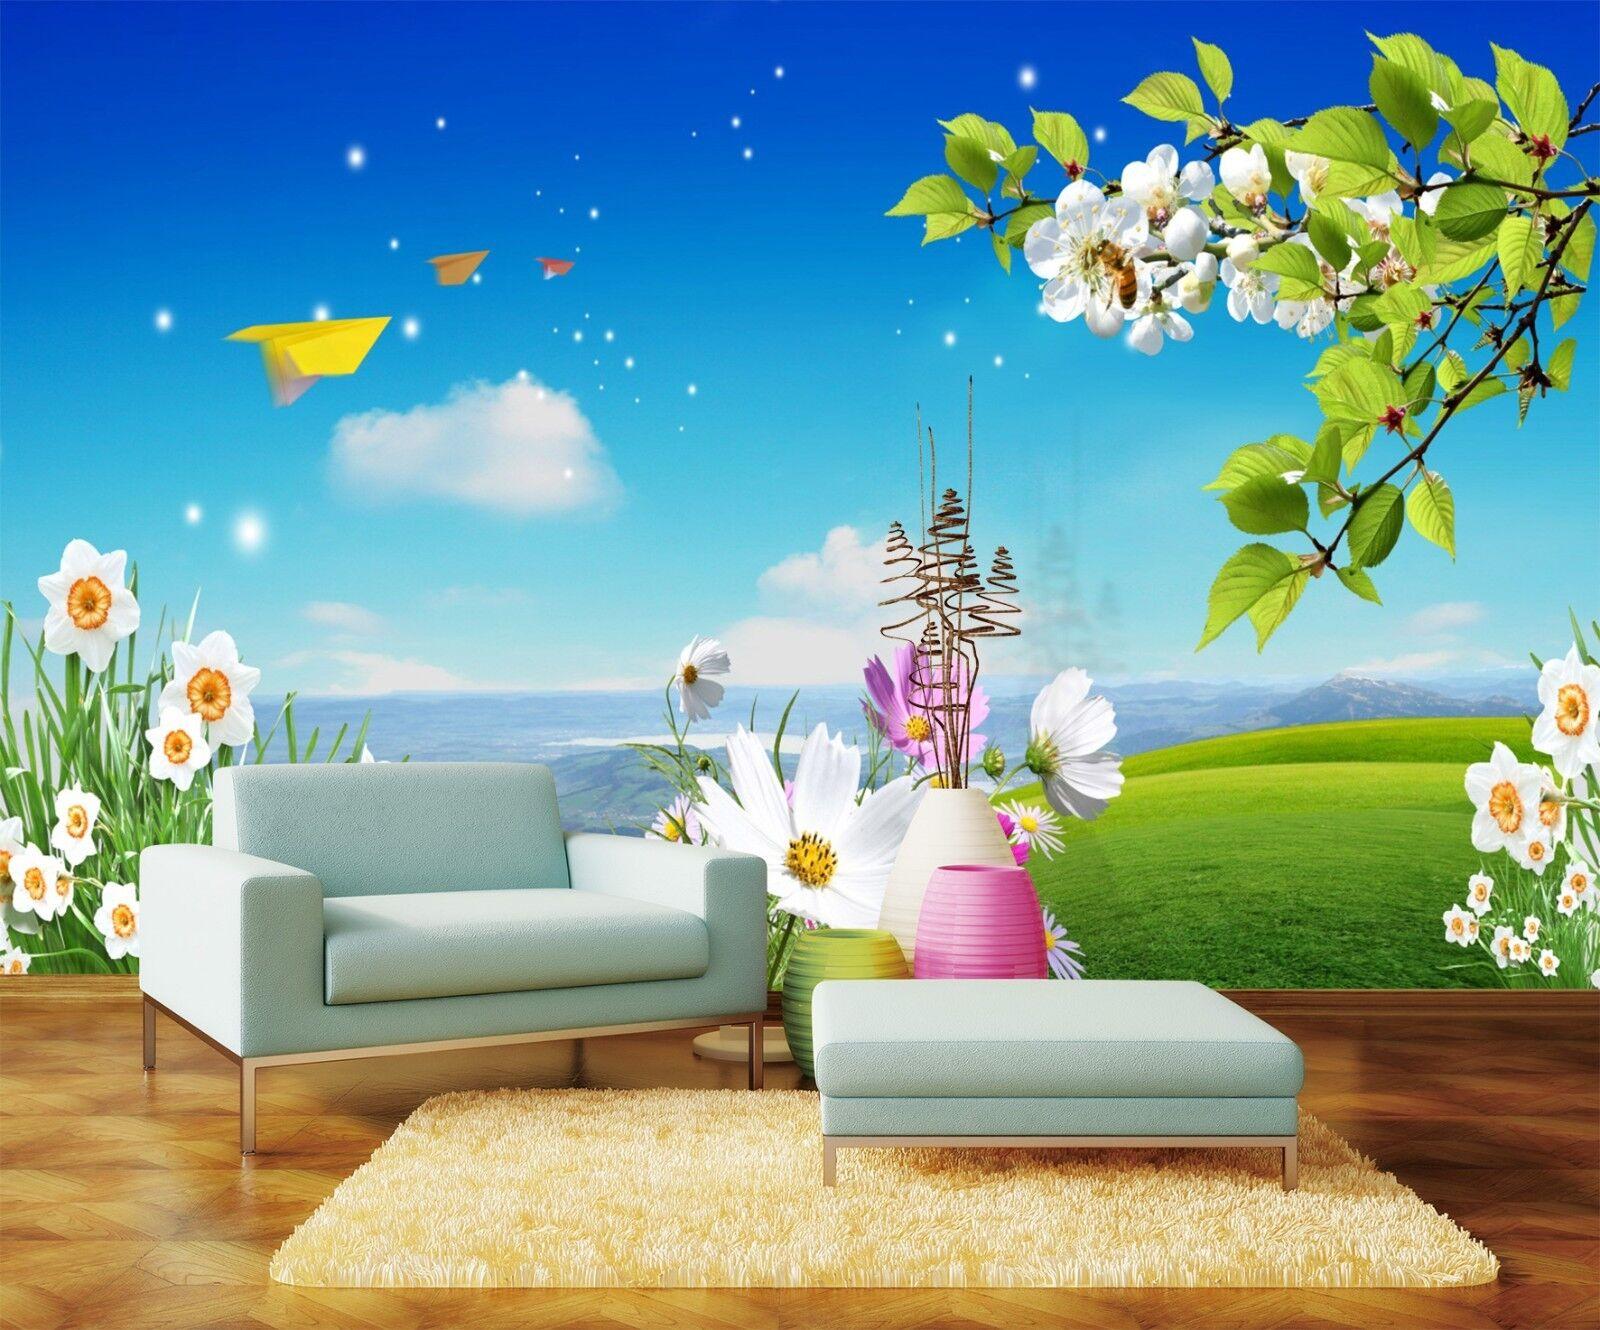 3D Hügel Blaumen Himmel 7844 Tapete Wandgemälde Tapeten Bild Familie DE Lemon | Großer Räumungsverkauf  | Günstige Preise  | Attraktives Aussehen